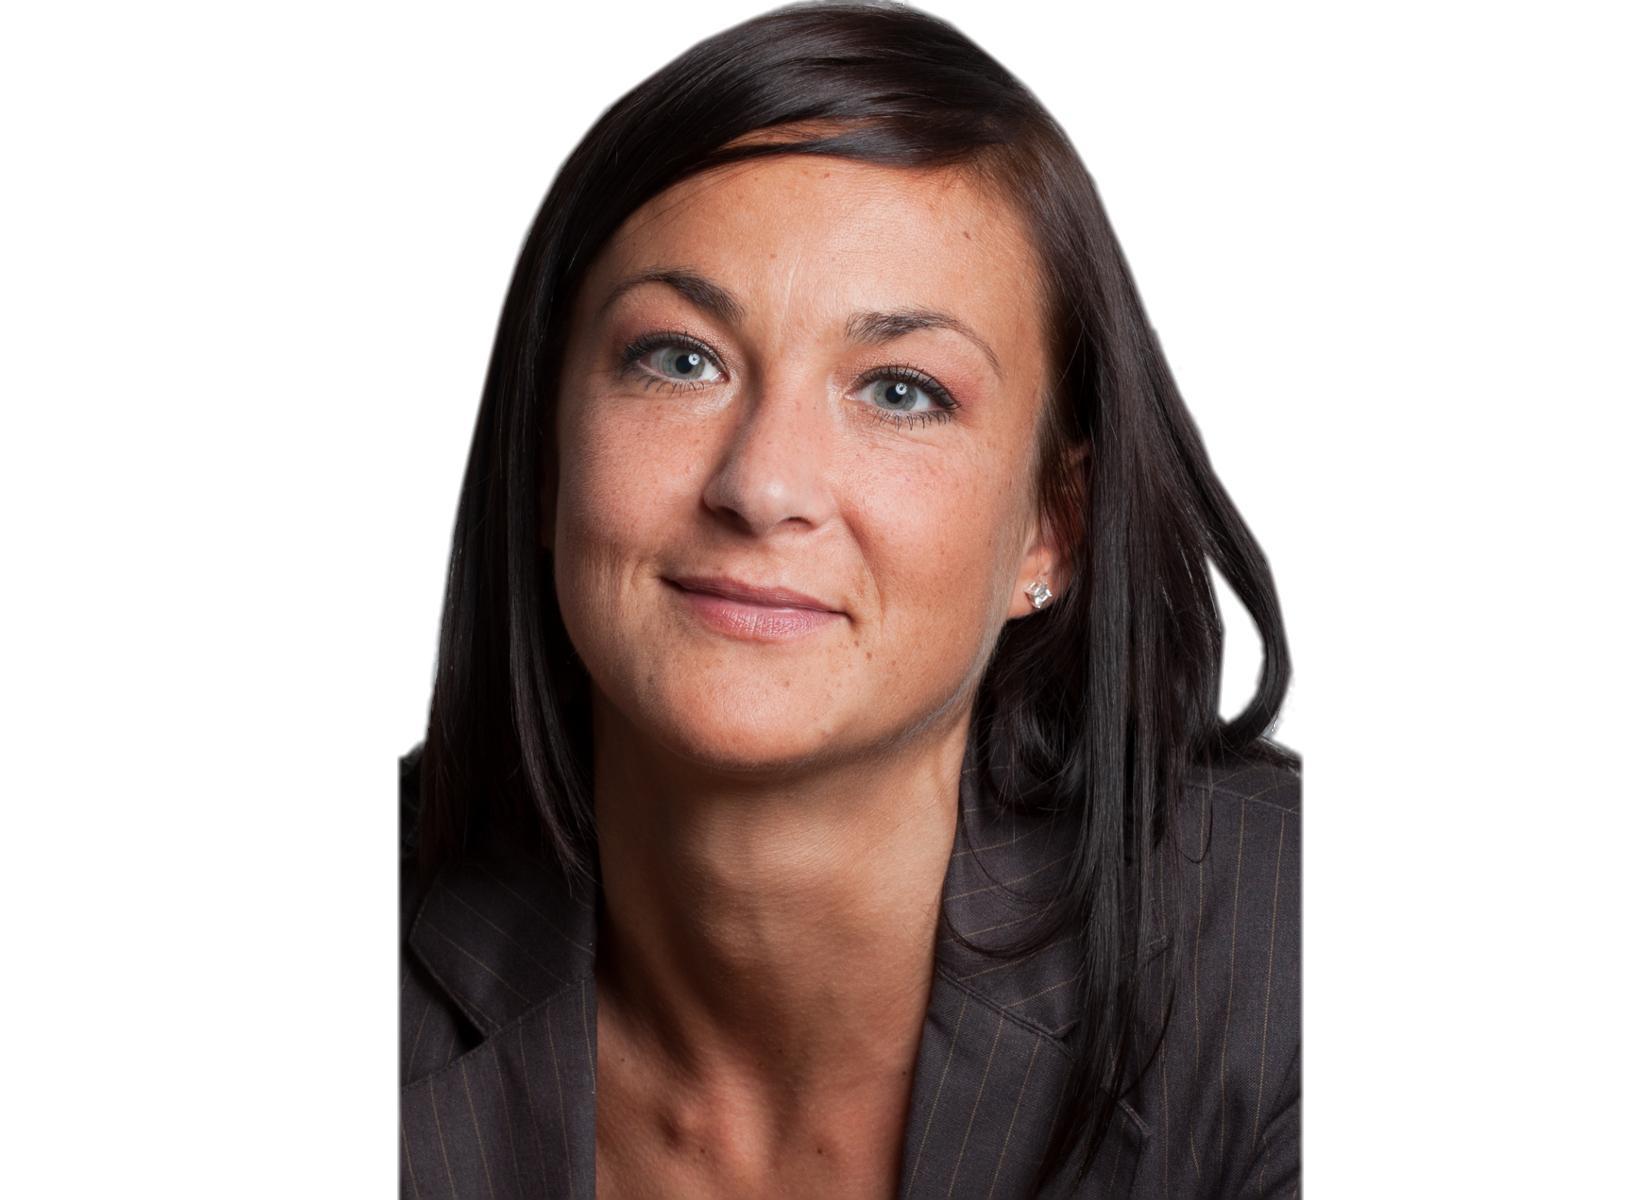 Martina Aichner